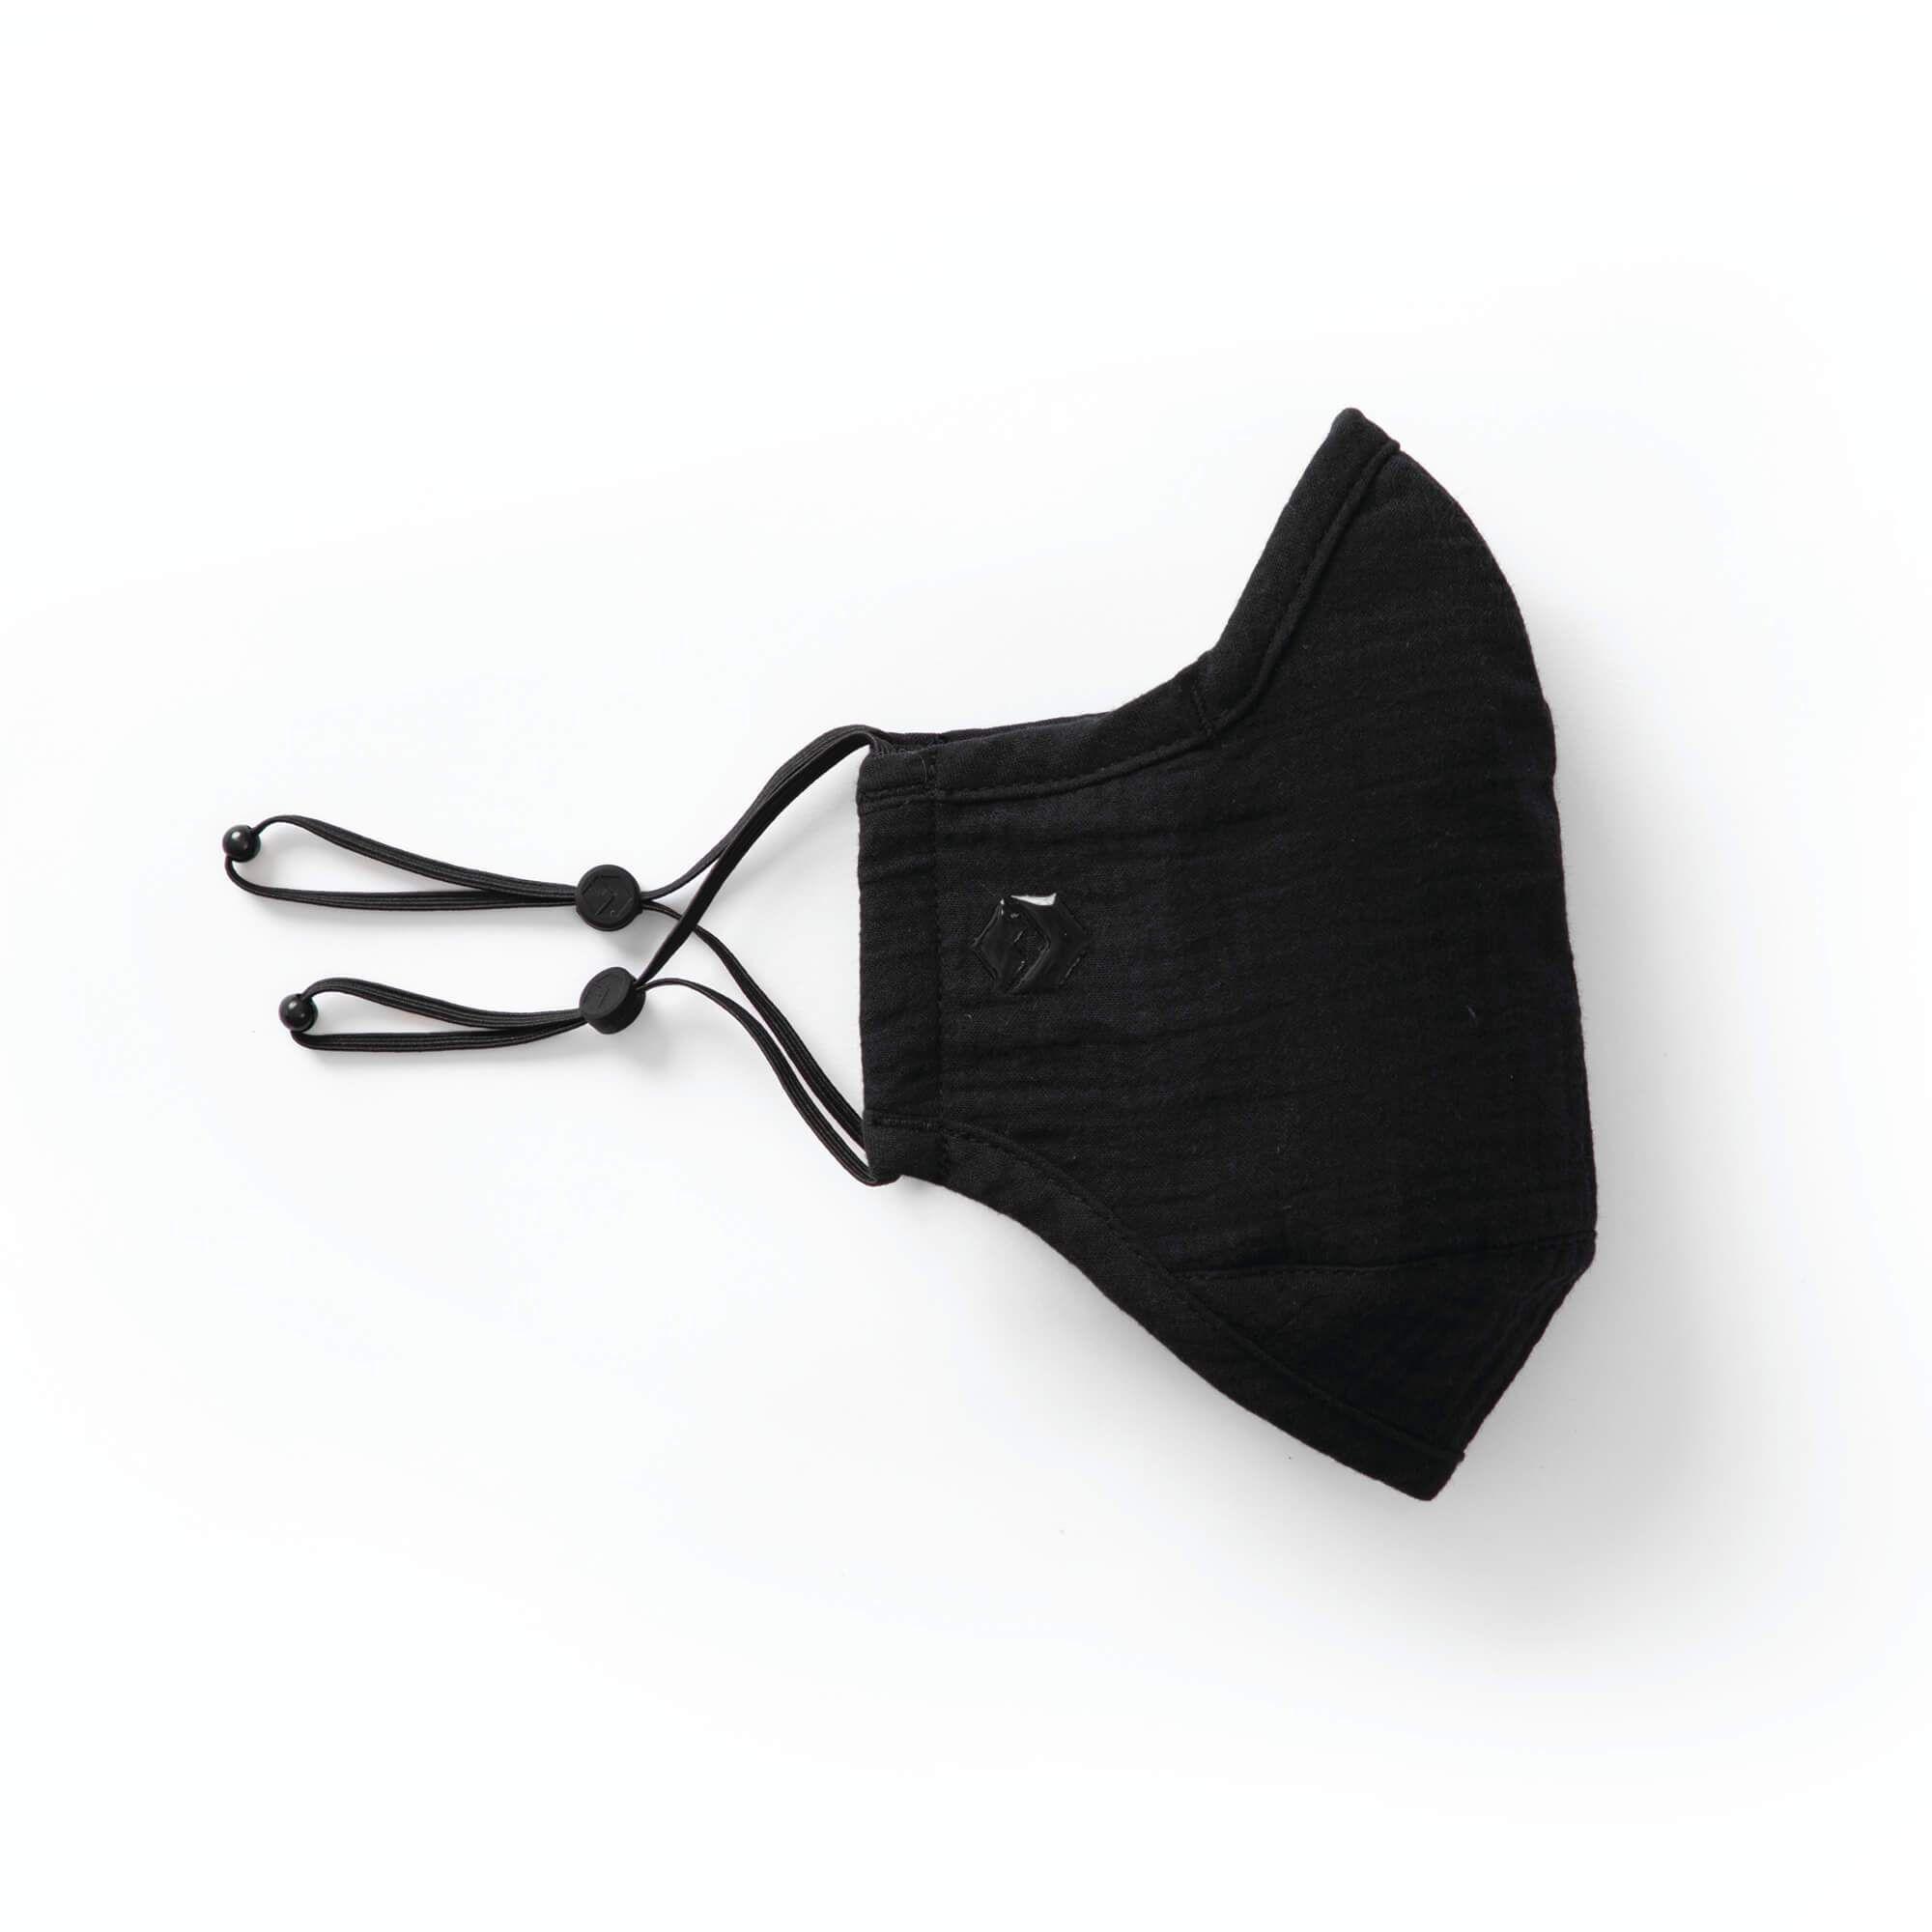 INEX Gear The Better Mask